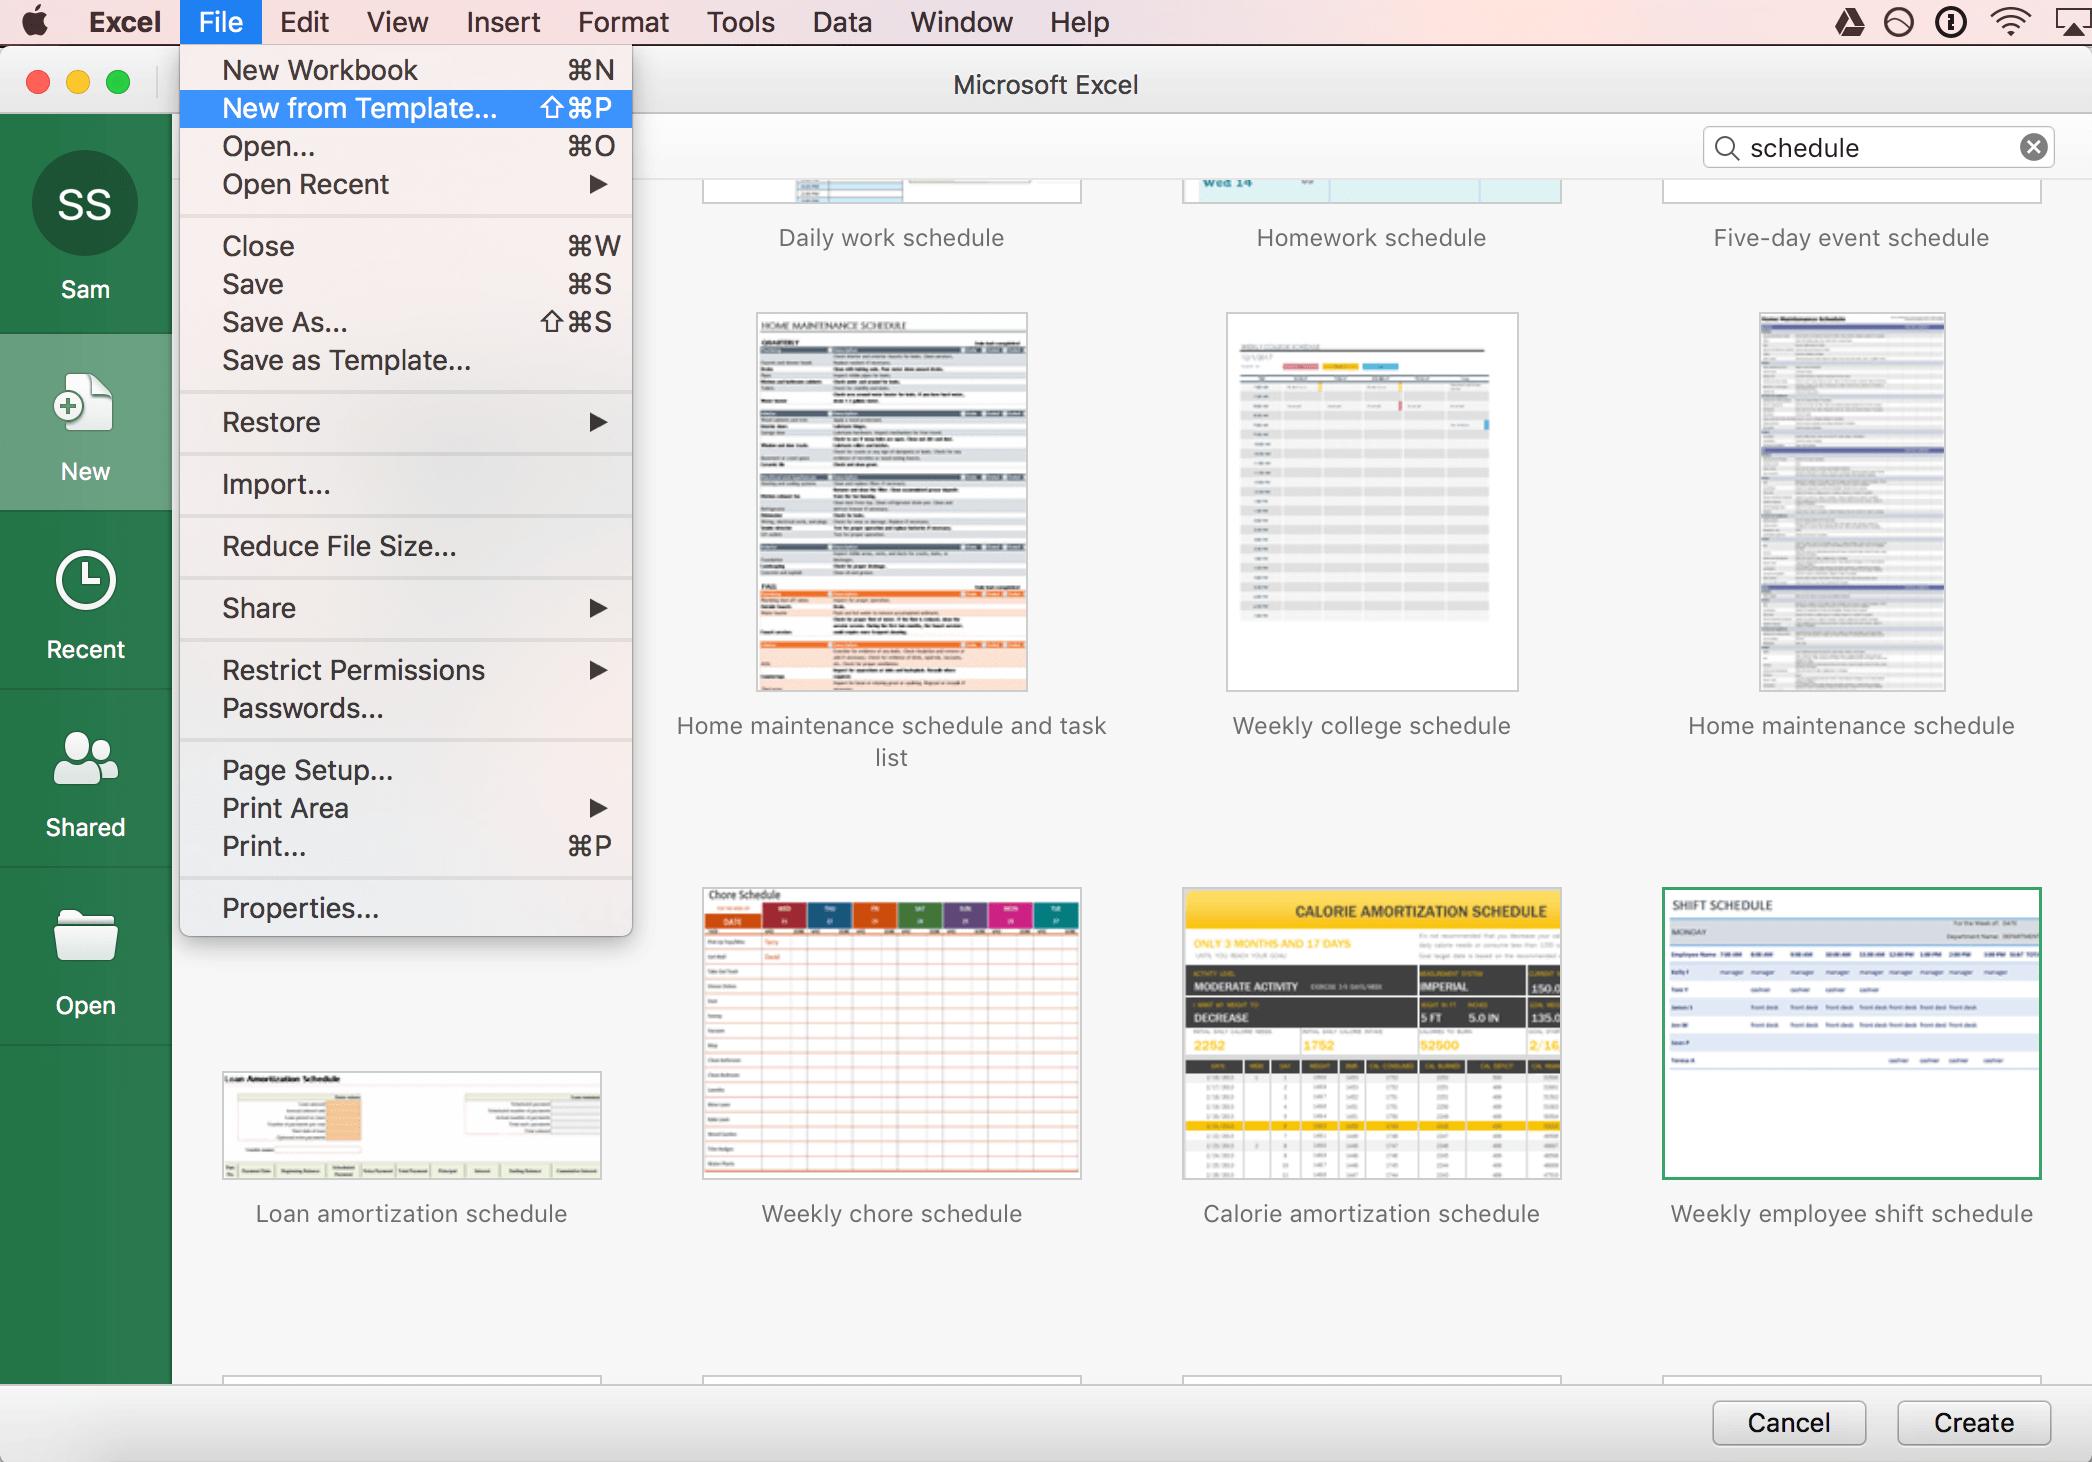 2 Free Ways To An Employee Shift Schedule | Homebase Intended For Employee Shift Scheduling Spreadsheet